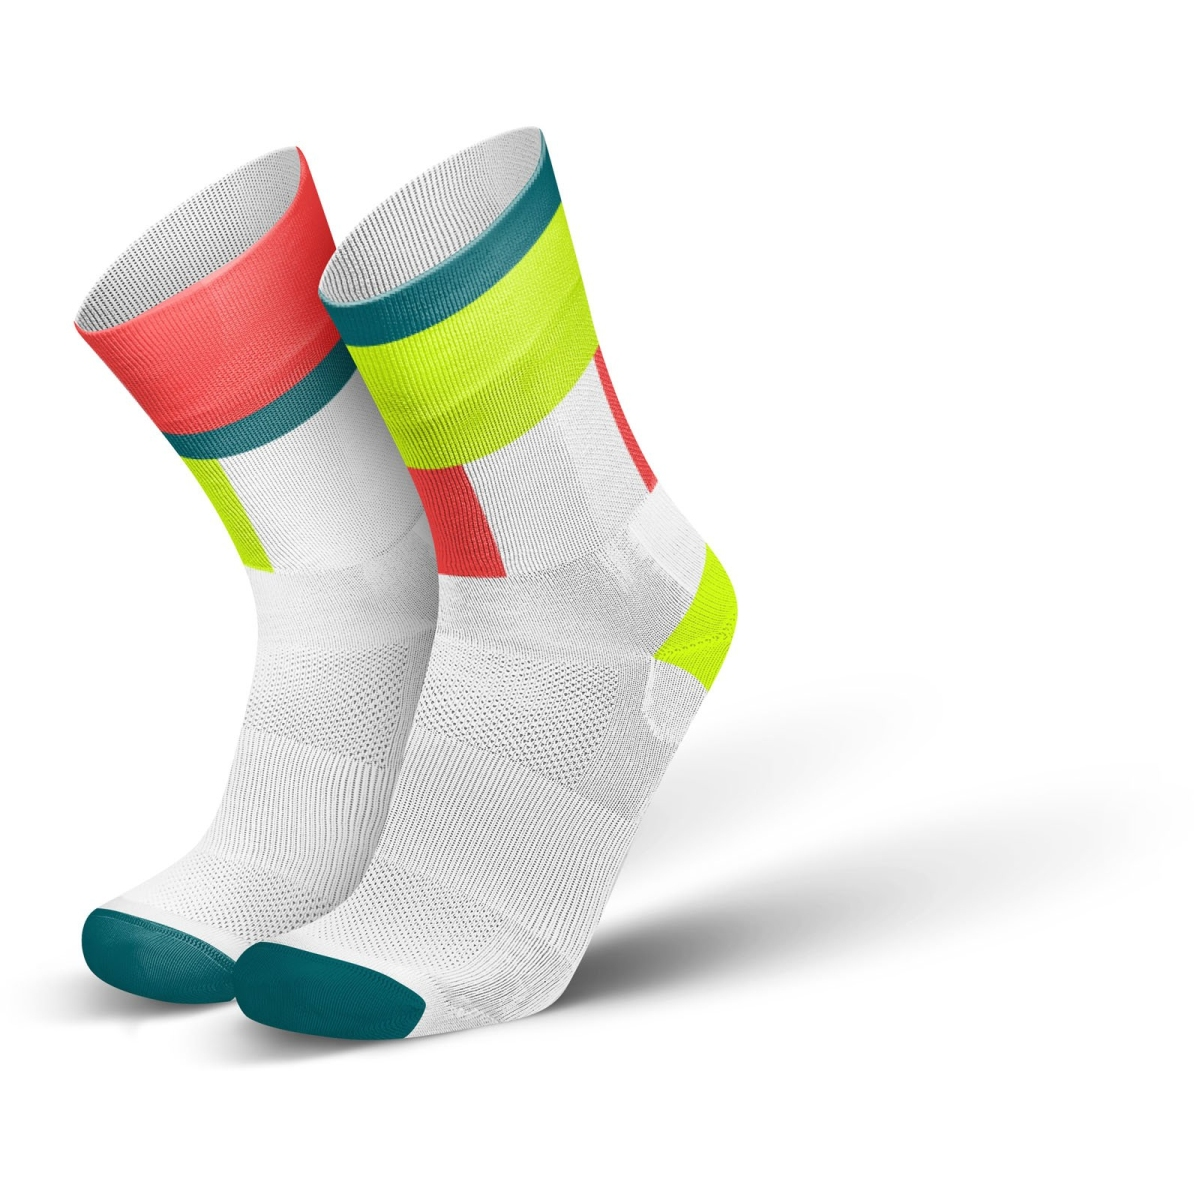 Produktbild von INCYLENCE Ultralight Zones Socken - Canary Inferno